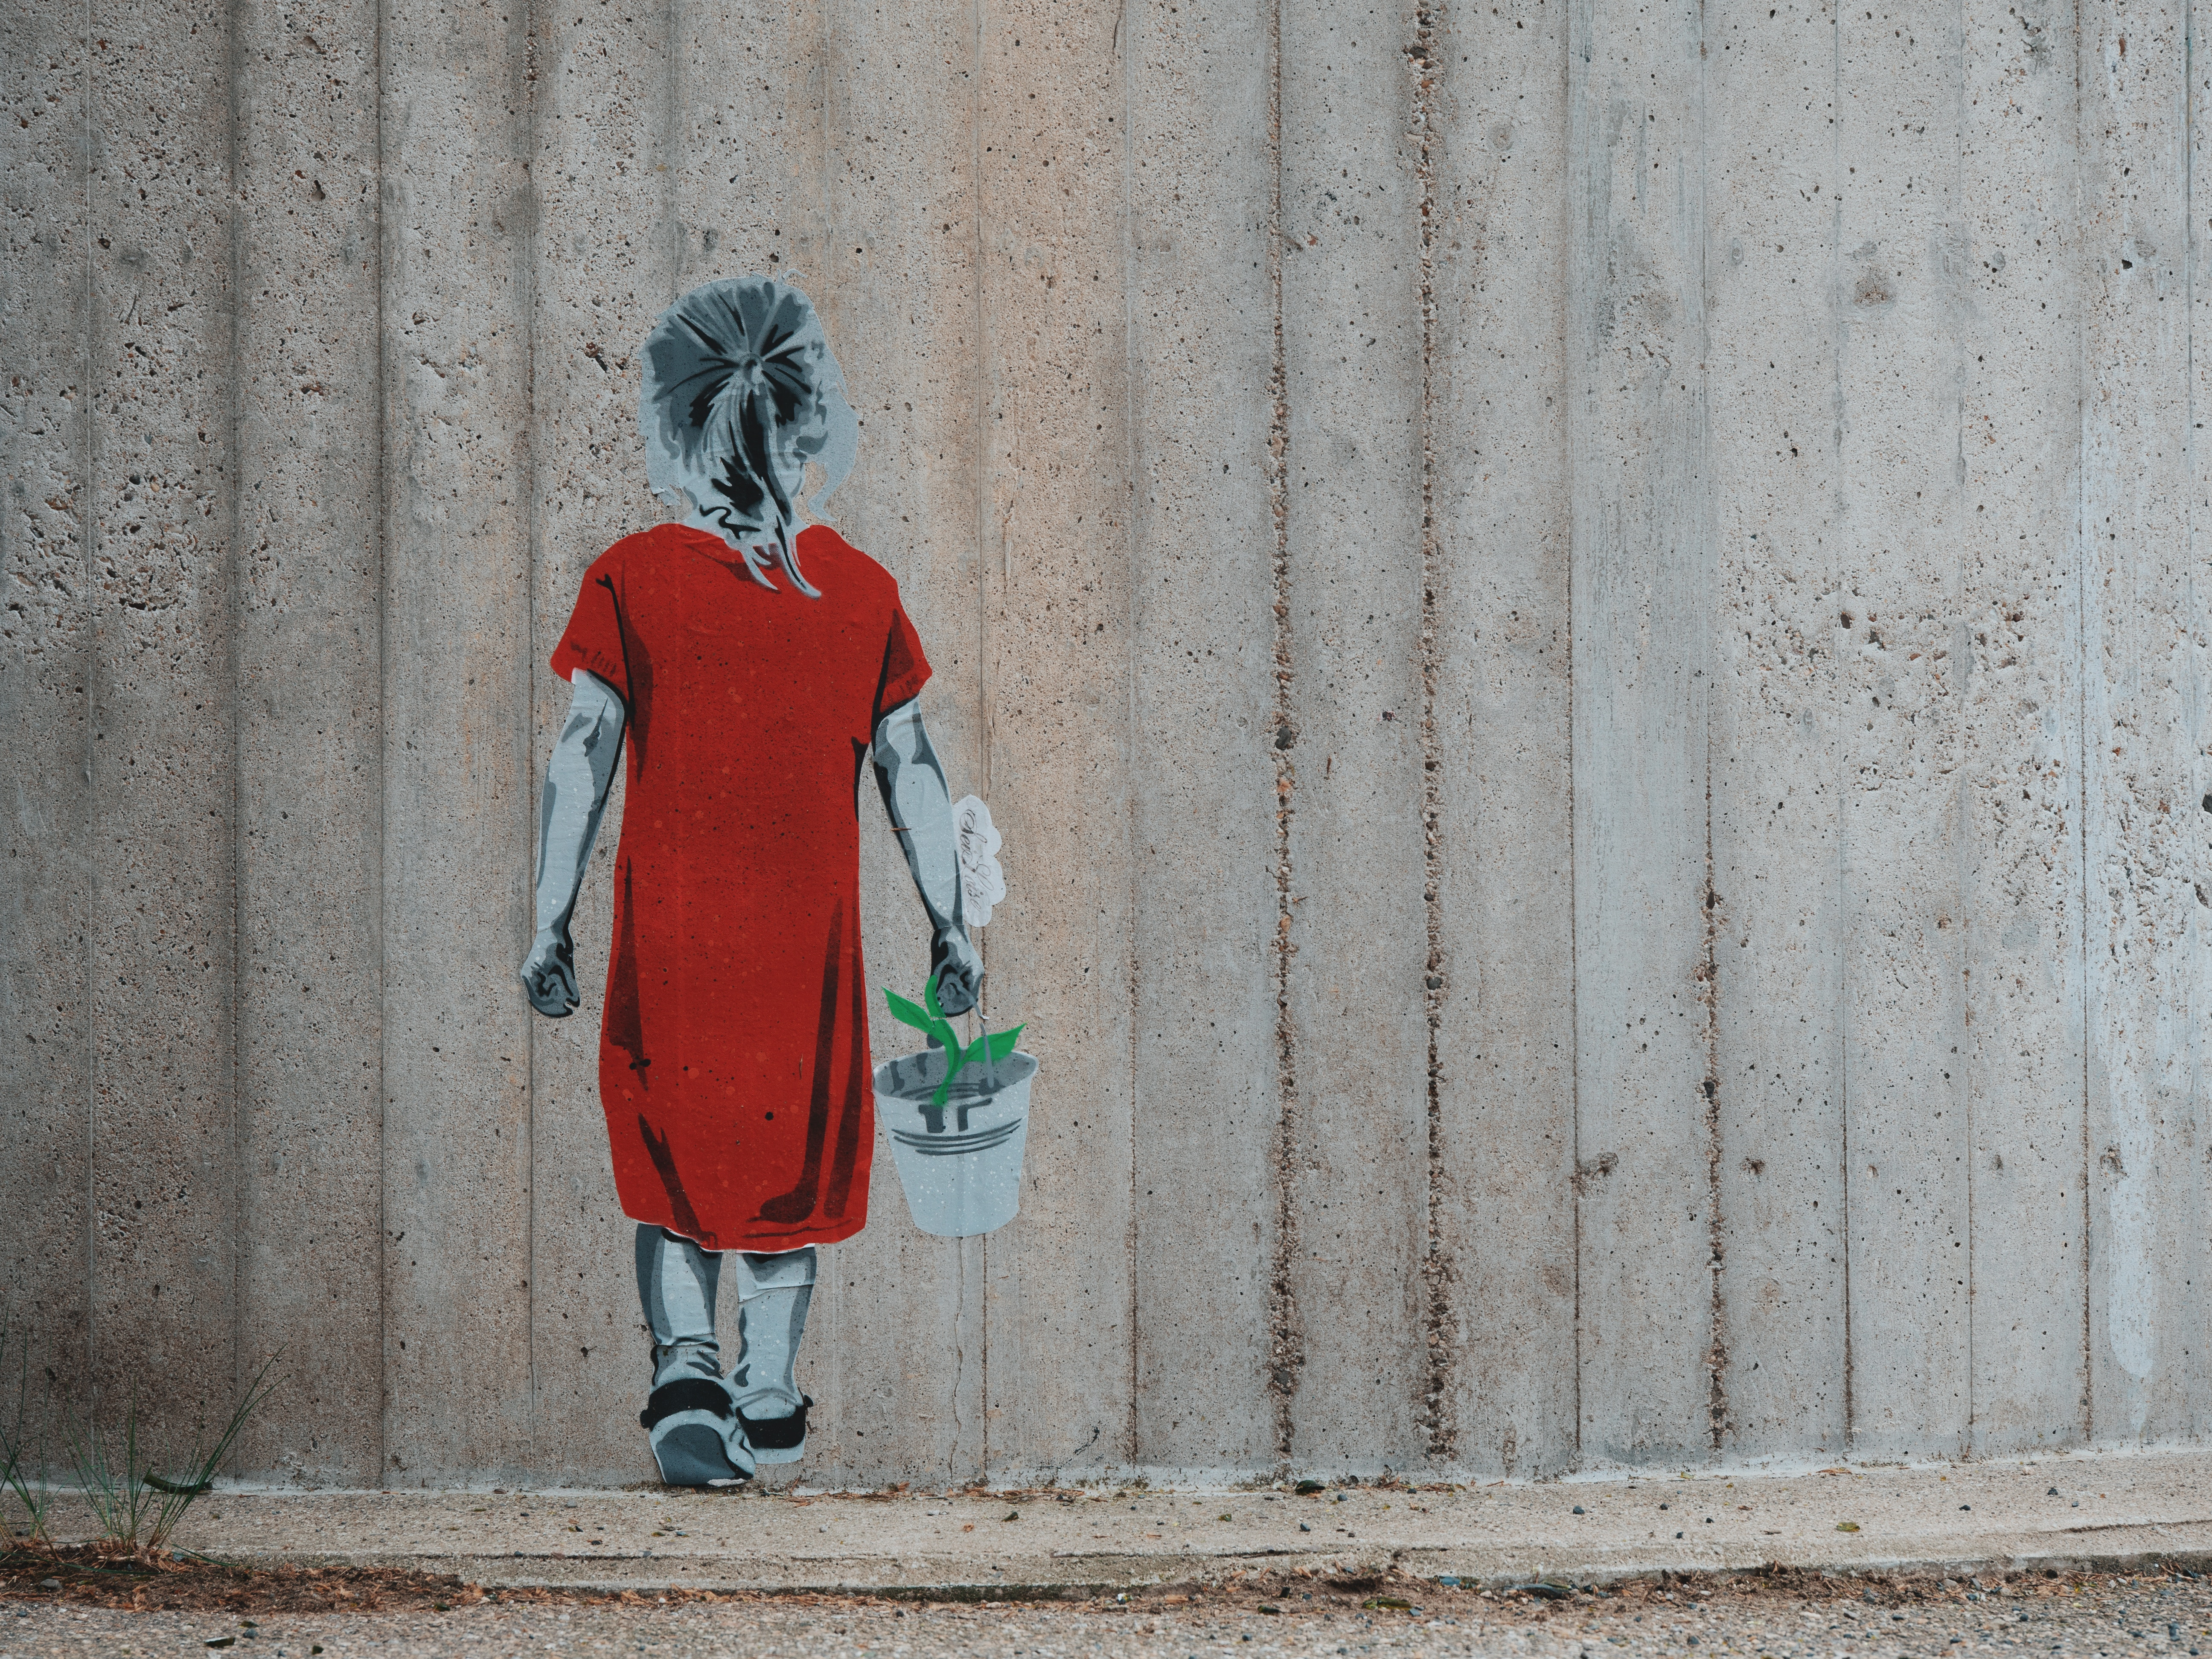 146277 скачать обои Арт, Граффити, Девочка, Цветок, Ведро, Стена, Стрит Арт - заставки и картинки бесплатно